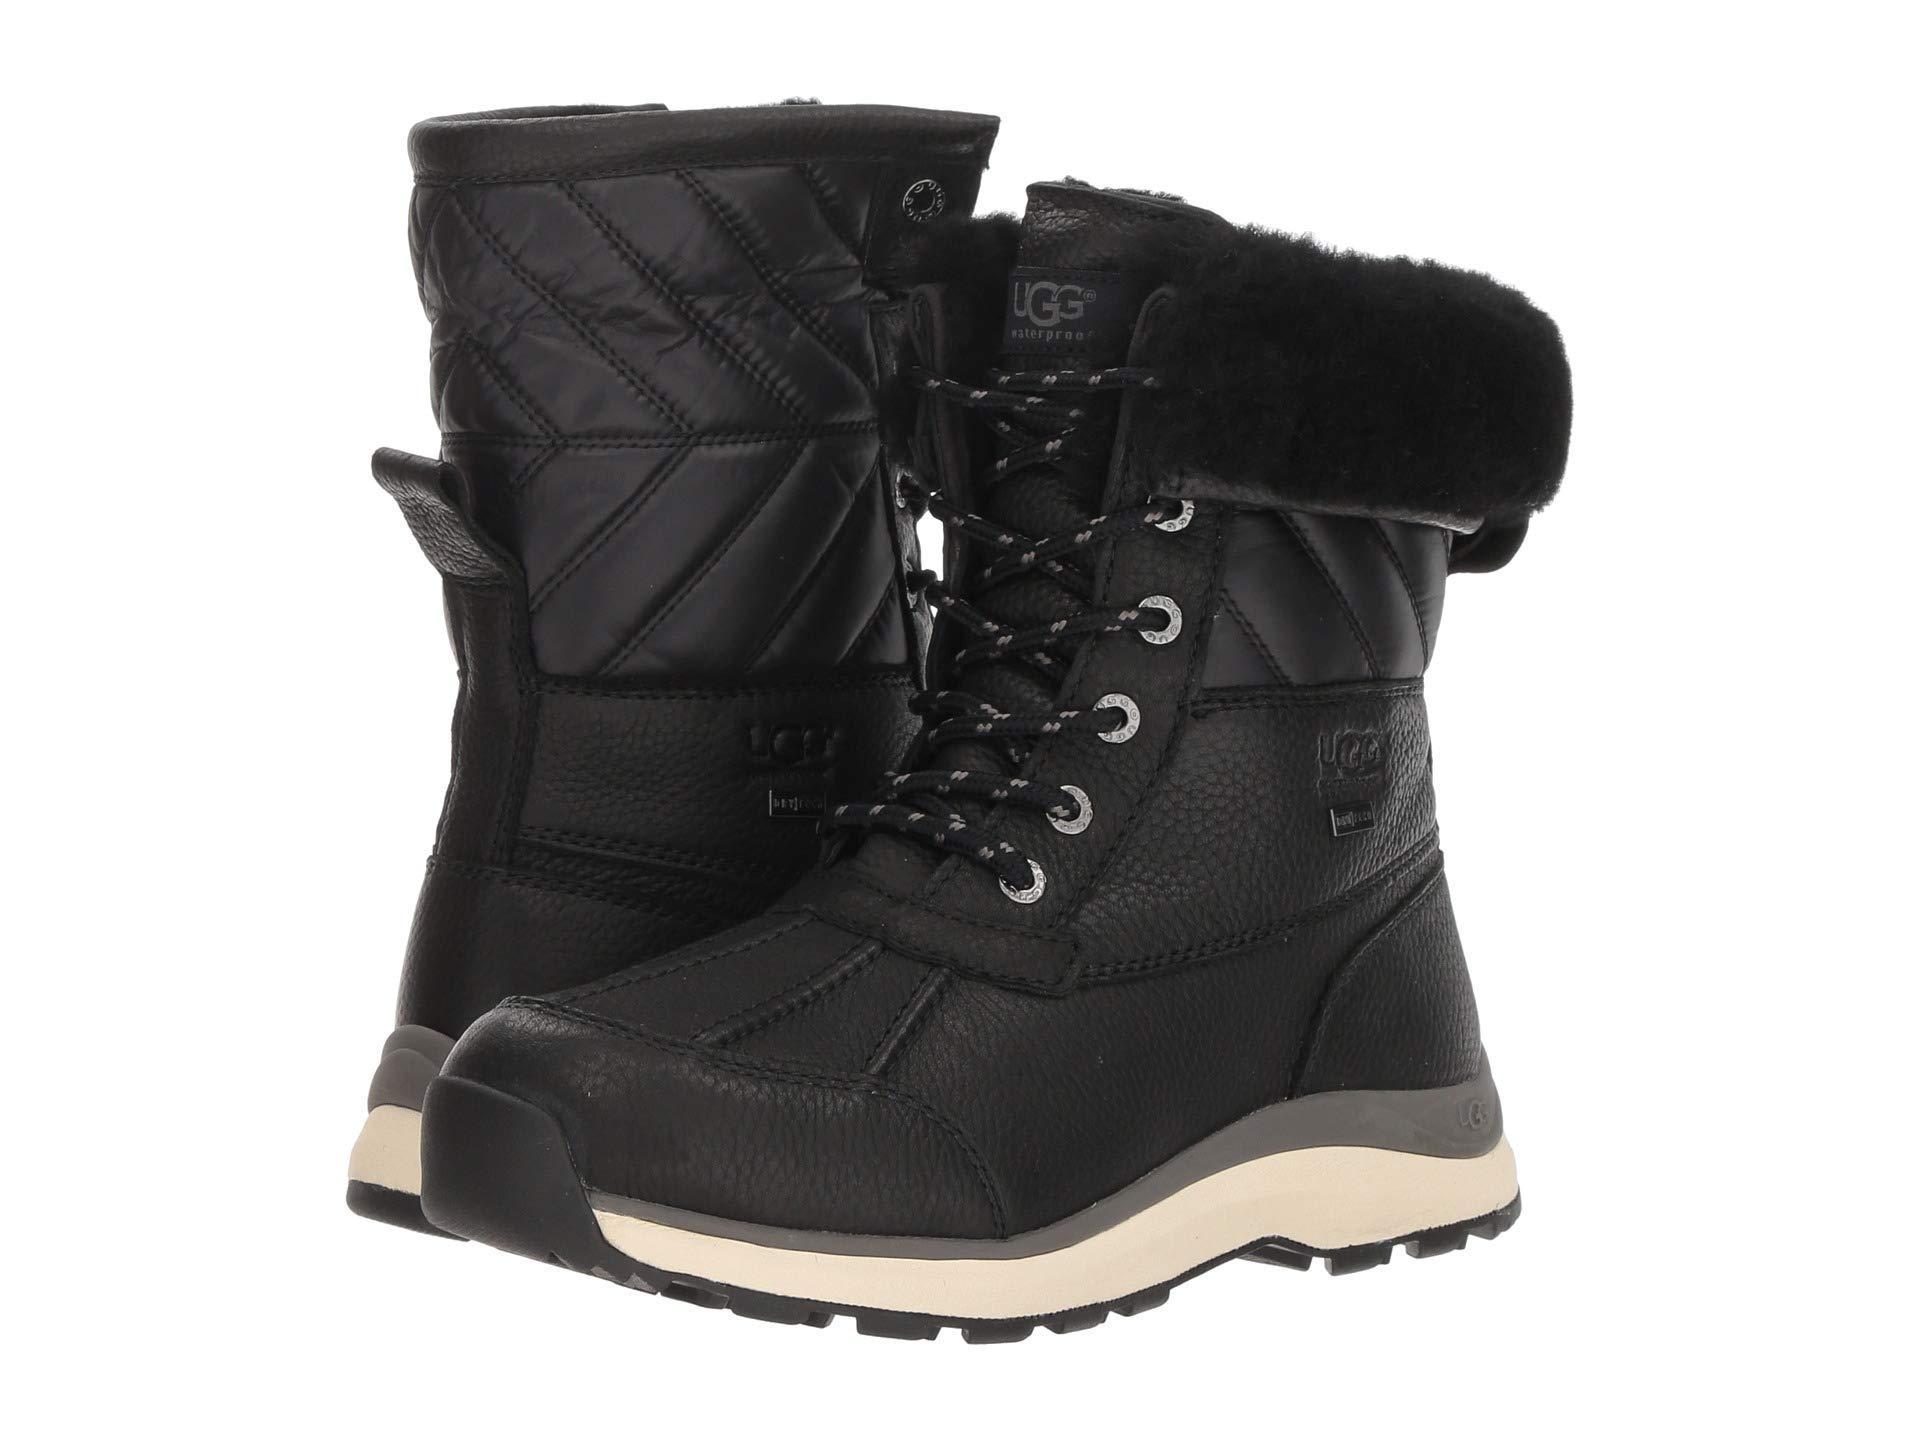 1682fa8c2d4 Lyst - UGG Adirondack Quilt Boot Iii in Black